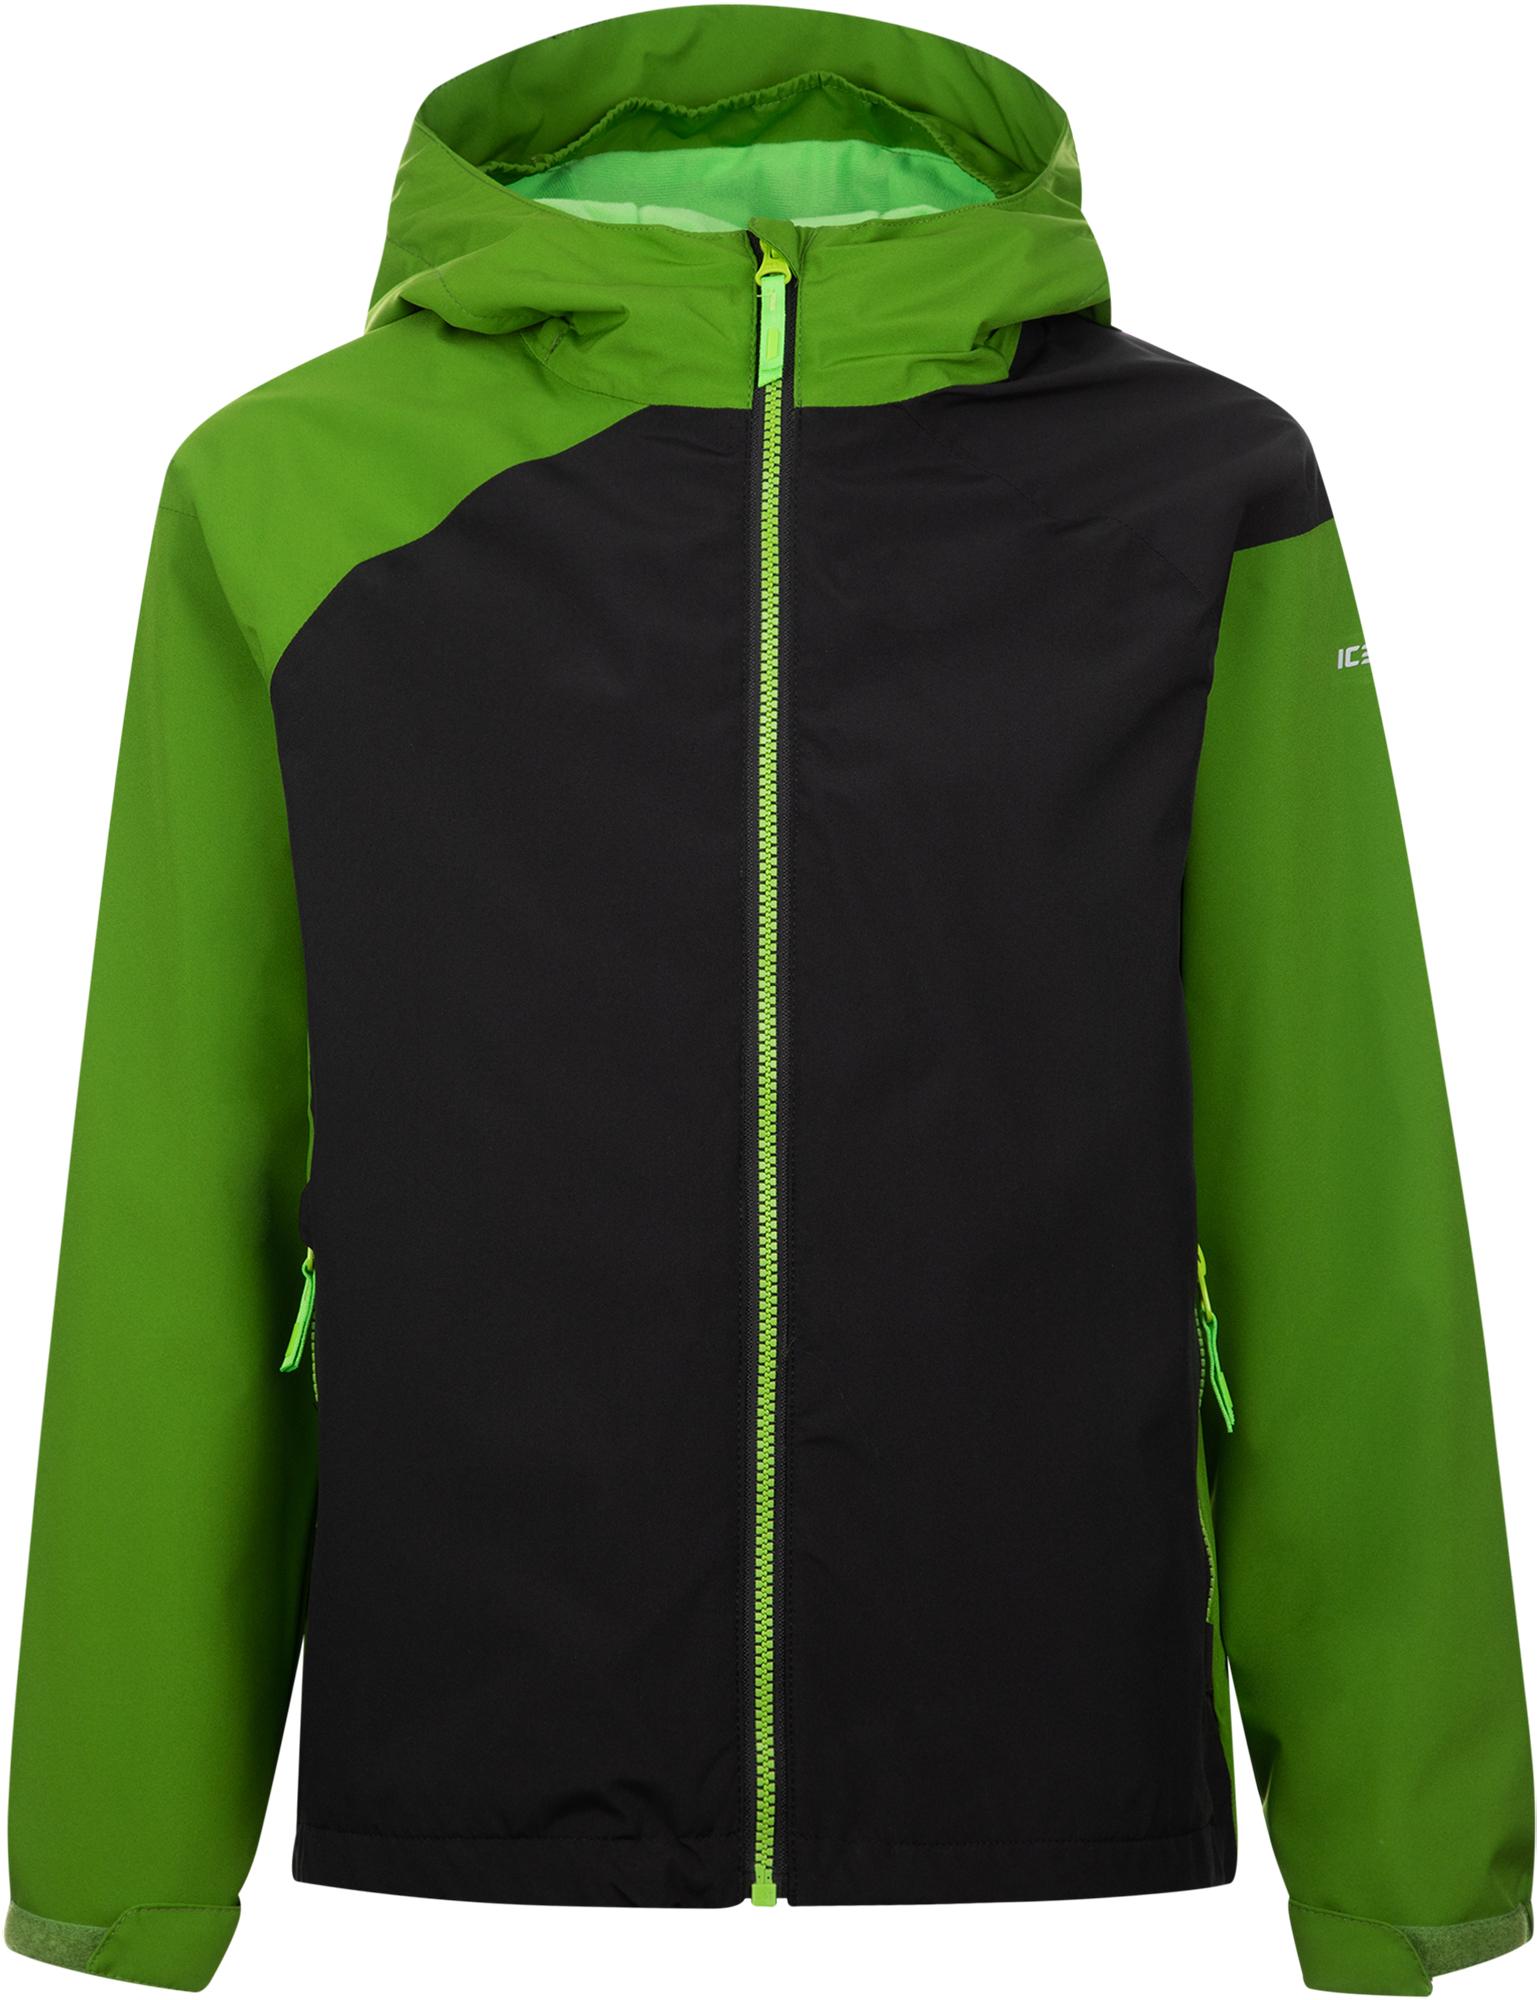 IcePeak Куртка для мальчиков IcePeak Kangley, размер 140